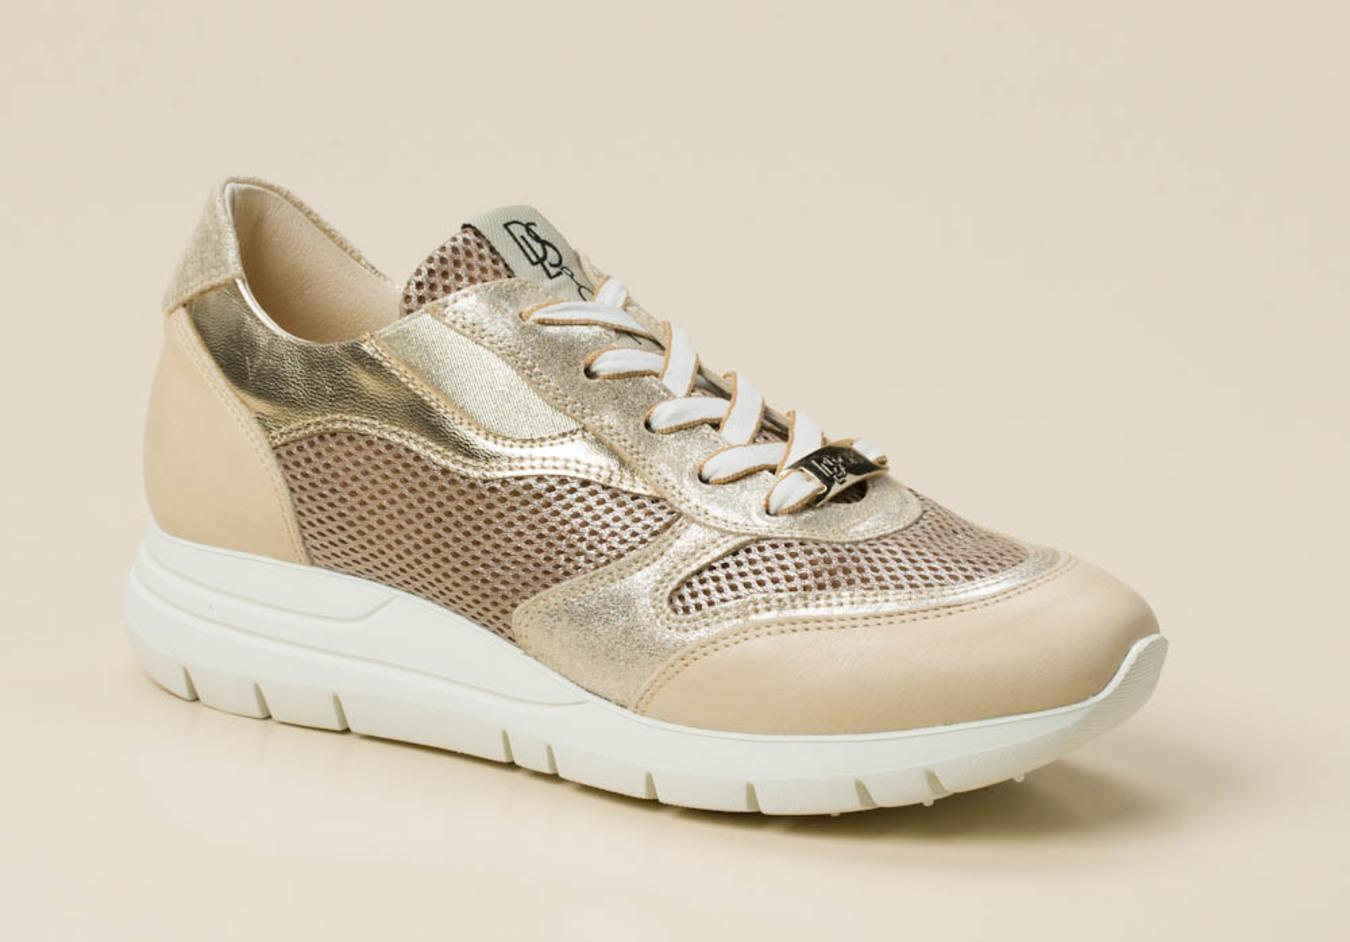 DL Sport Damen Sneaker in beige kaufen | Zumnorde Online Shop